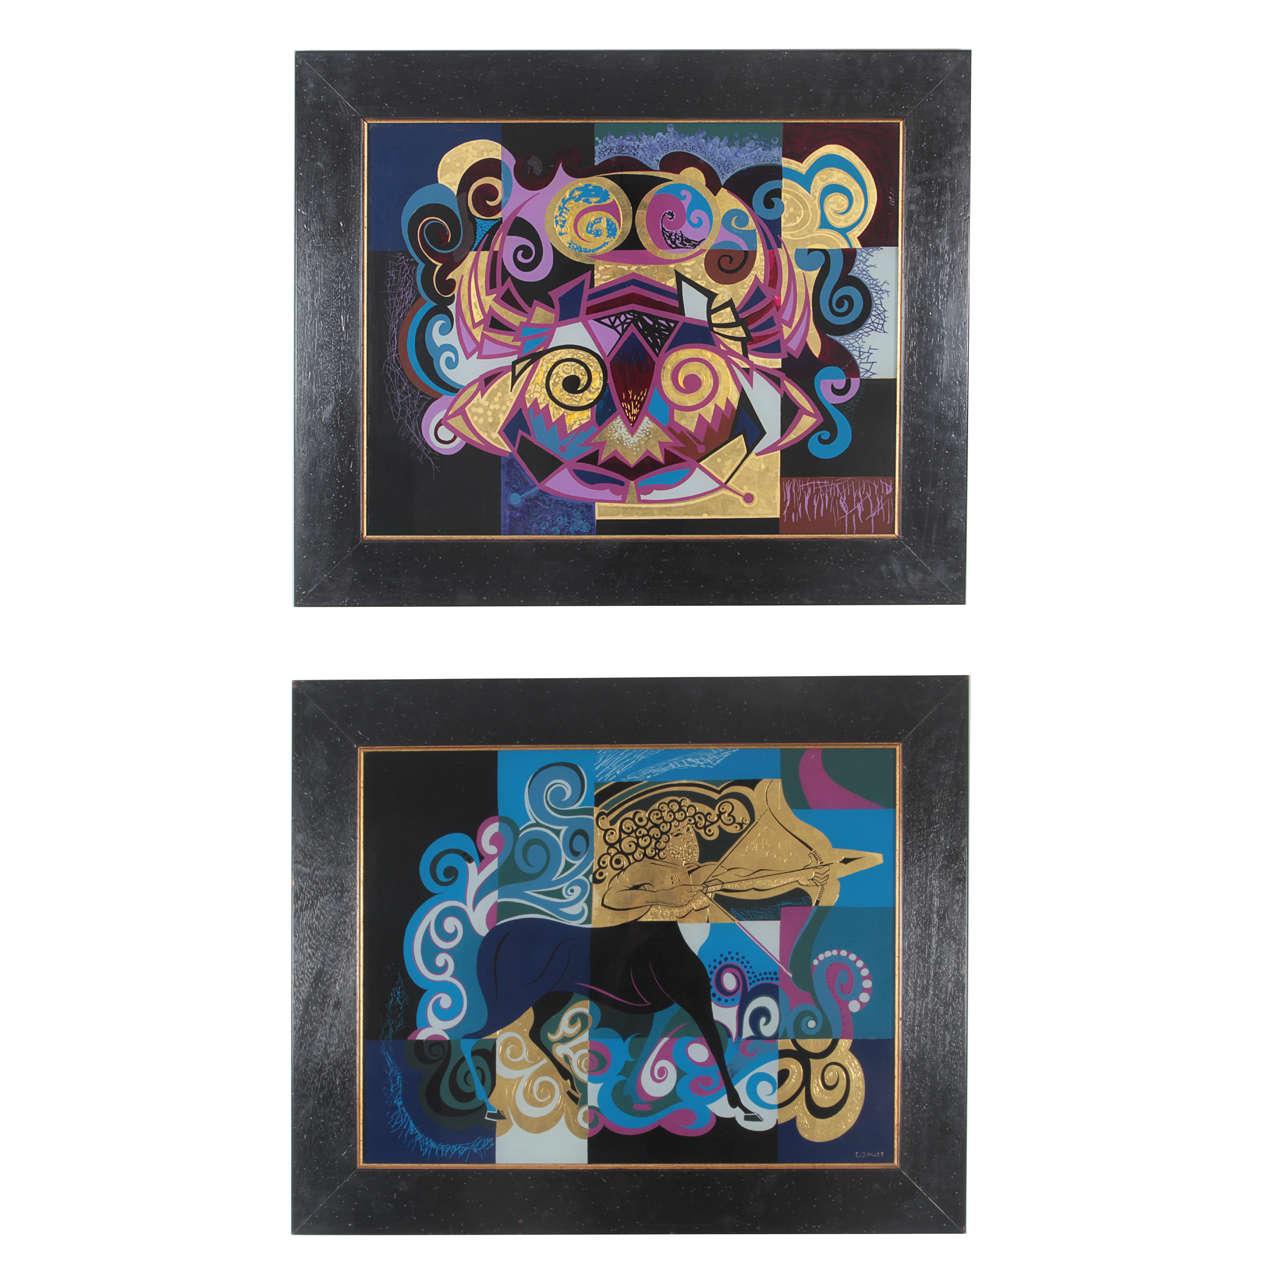 Pair of Reverse Painted Glass Paintings